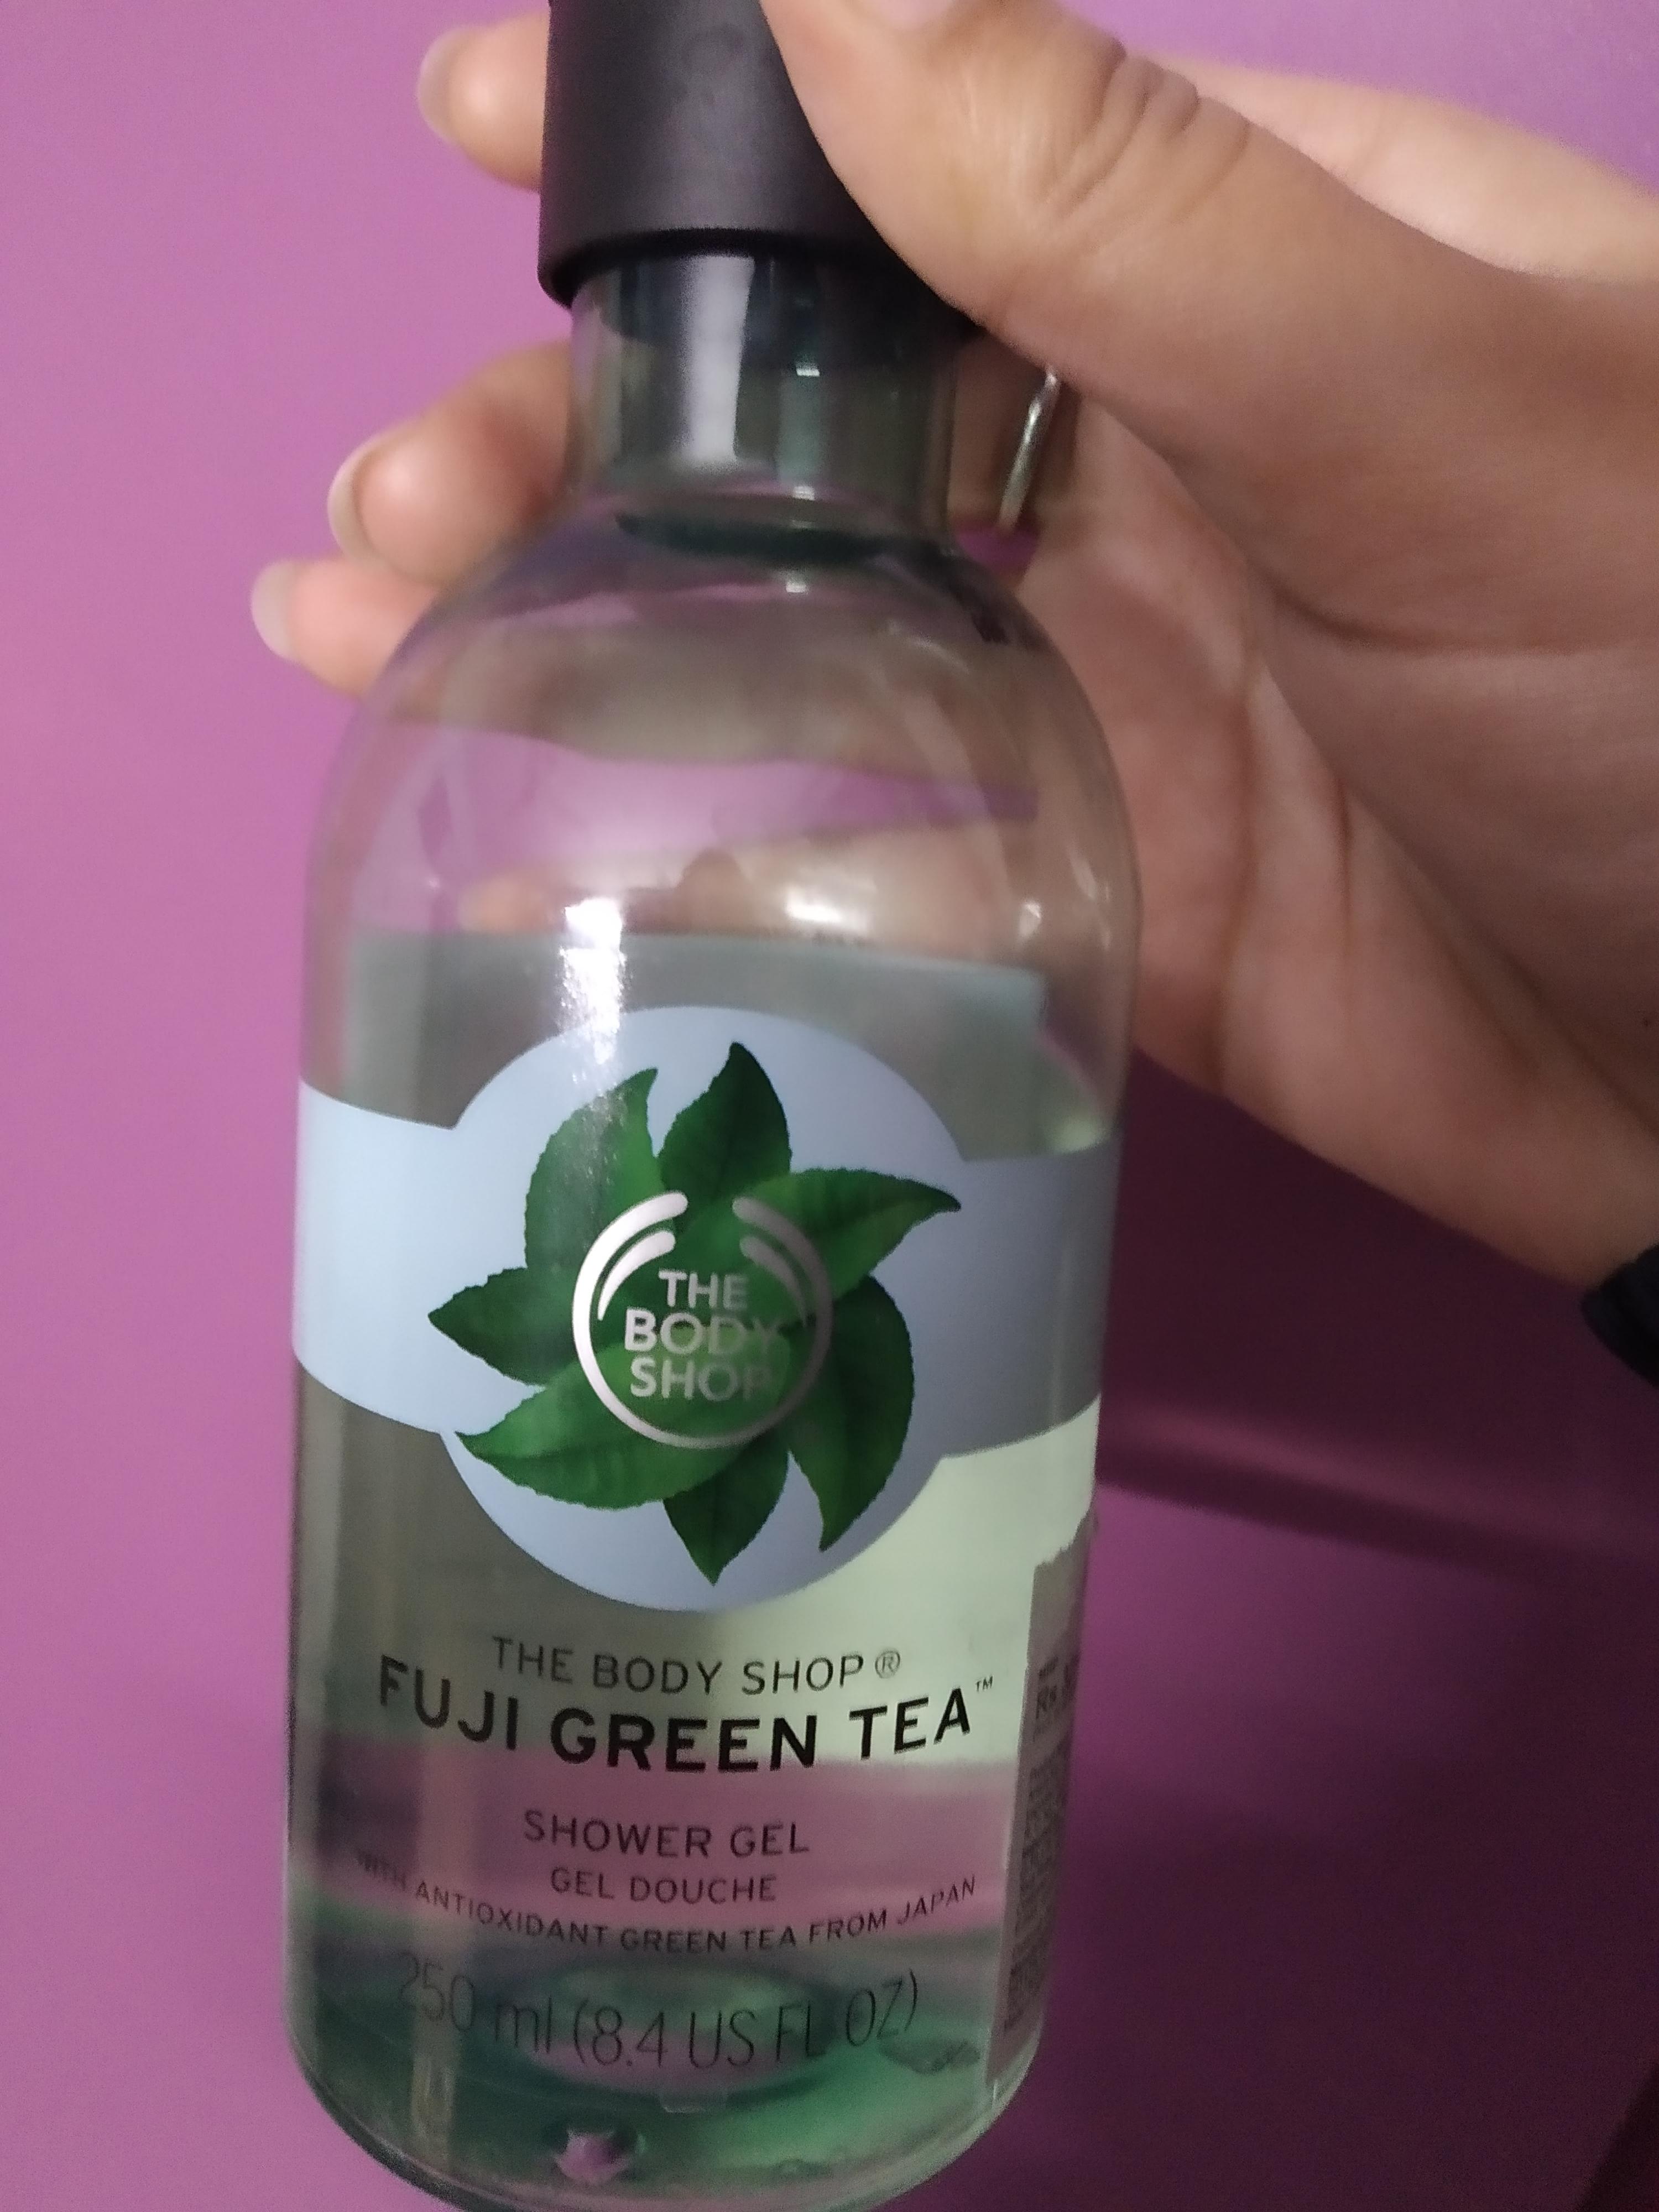 The Body Shop Fuji Green Tea Shower Gel -Detoxifying fragrance-By ipshita1